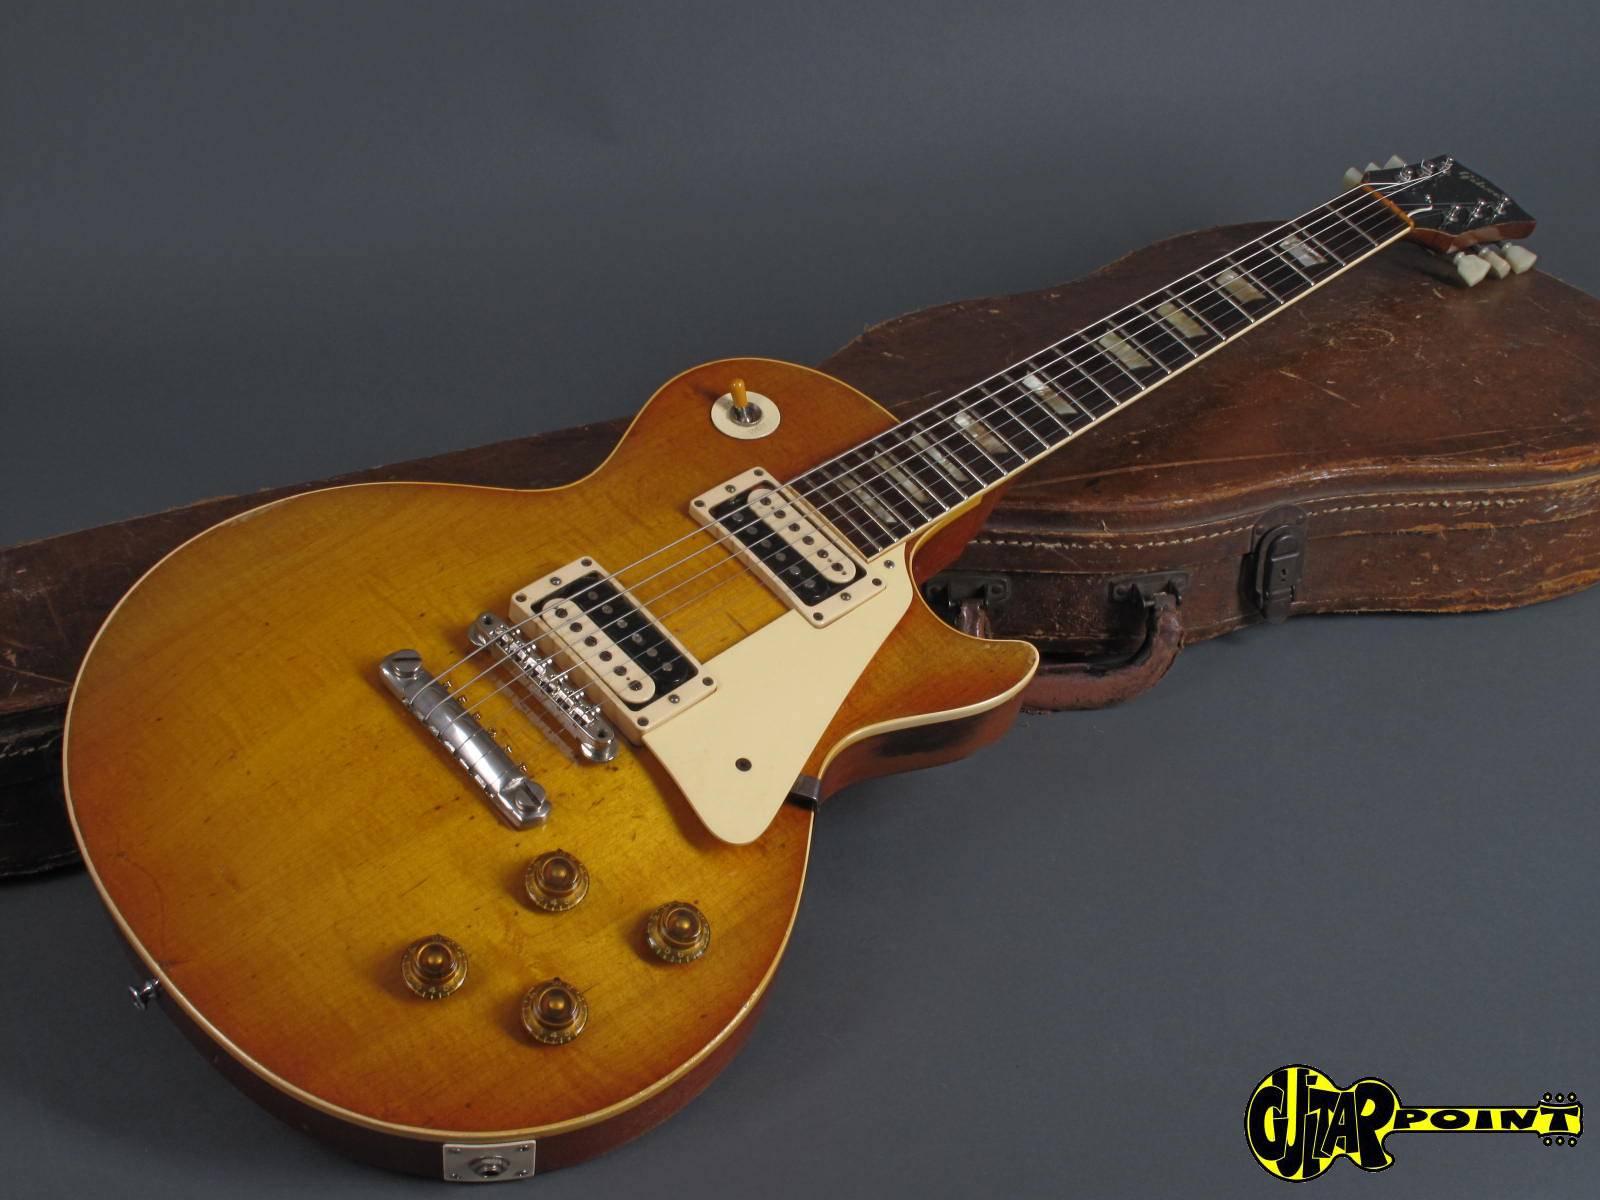 gibson les paul standard 1958 sunburst guitar for sale guitarpoint. Black Bedroom Furniture Sets. Home Design Ideas